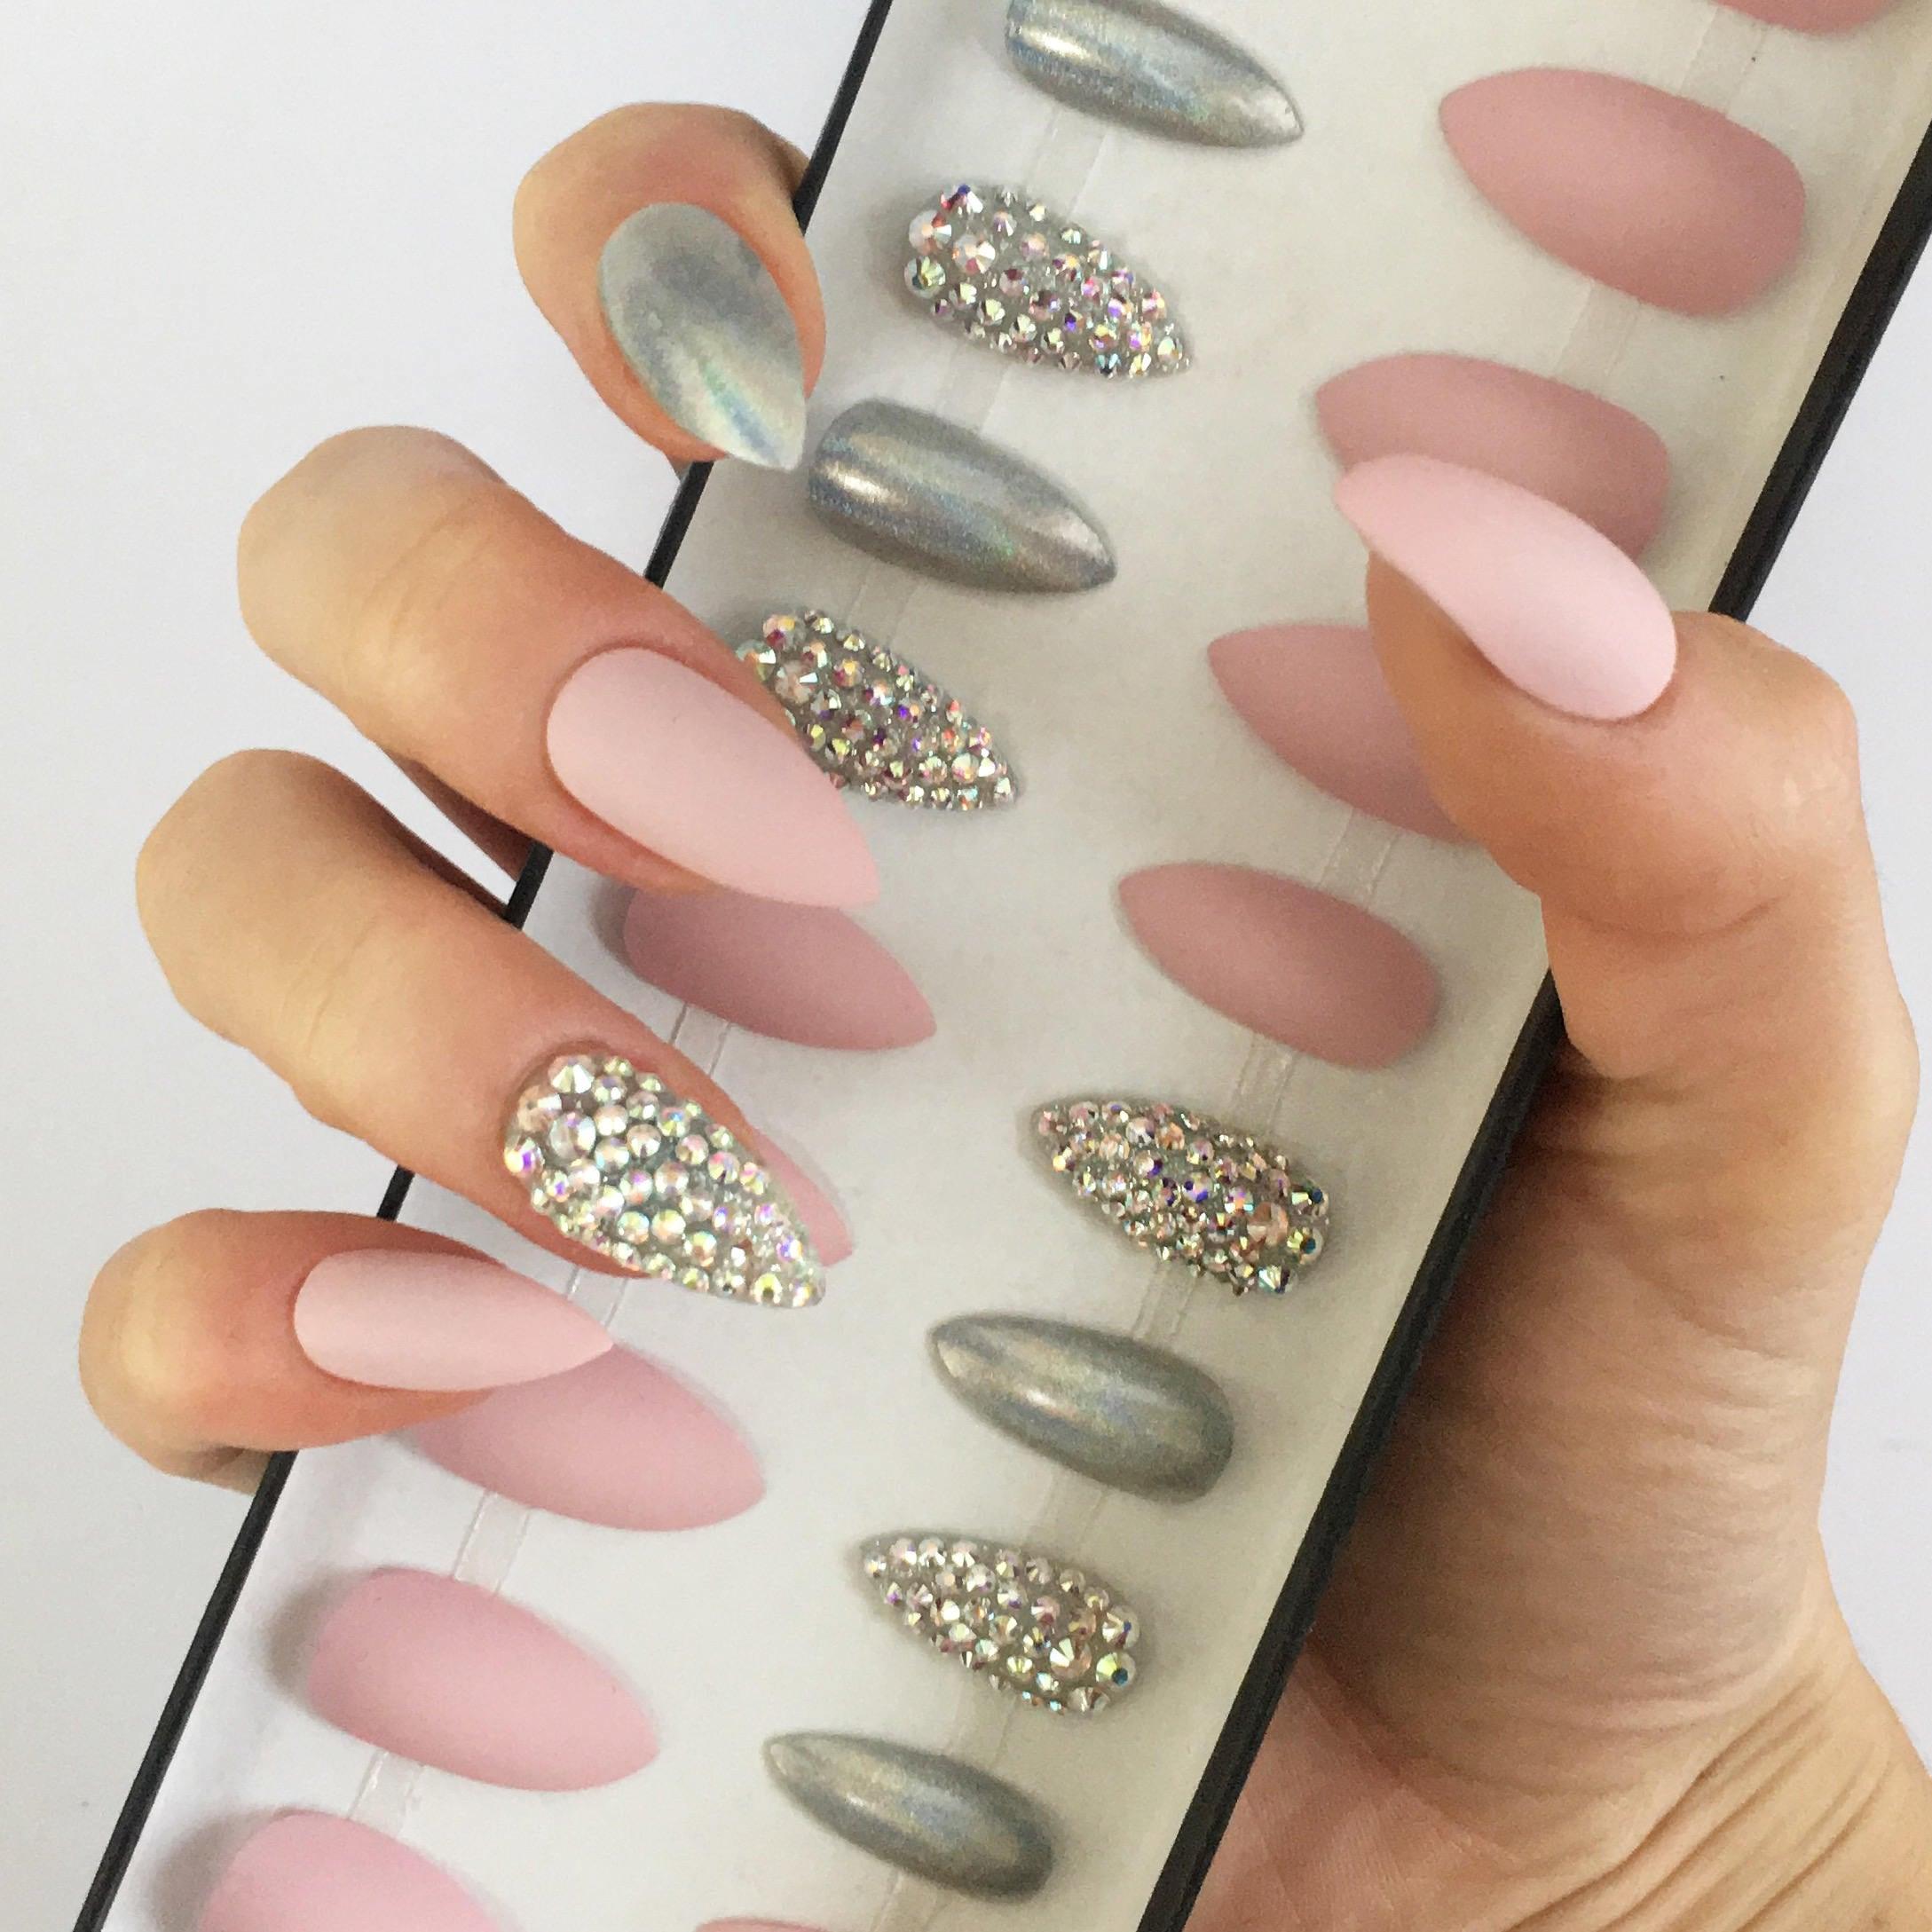 Rosa Presse auf Nägel Swarovski Kristalle Stiletto Nägel